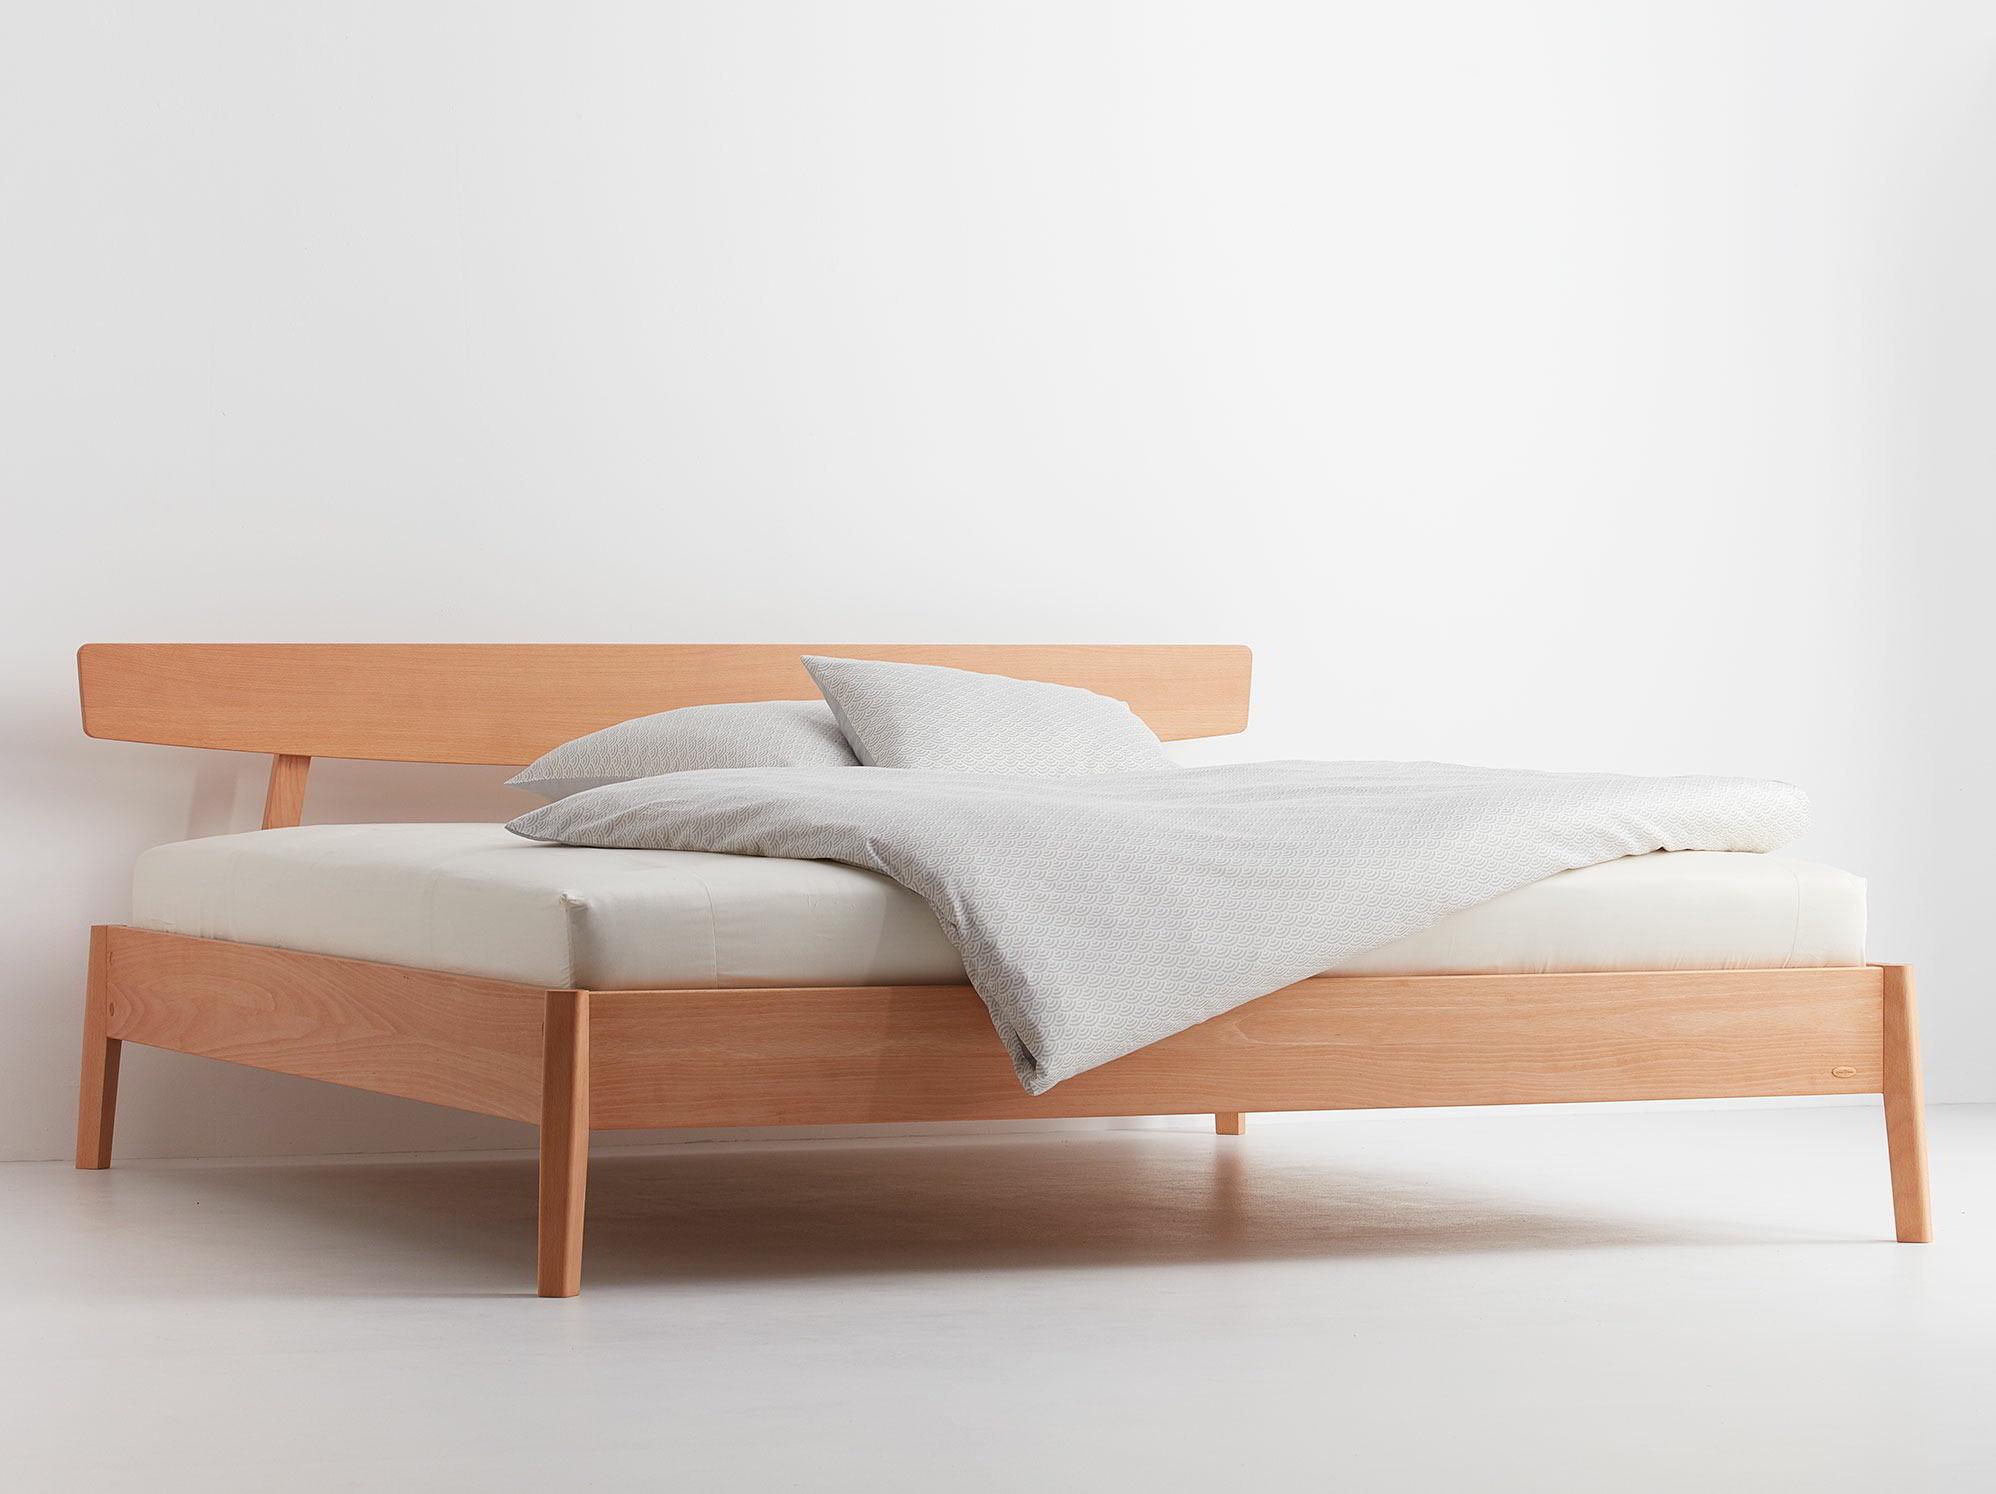 bett arne mit kopfhaupt gr ne erde. Black Bedroom Furniture Sets. Home Design Ideas